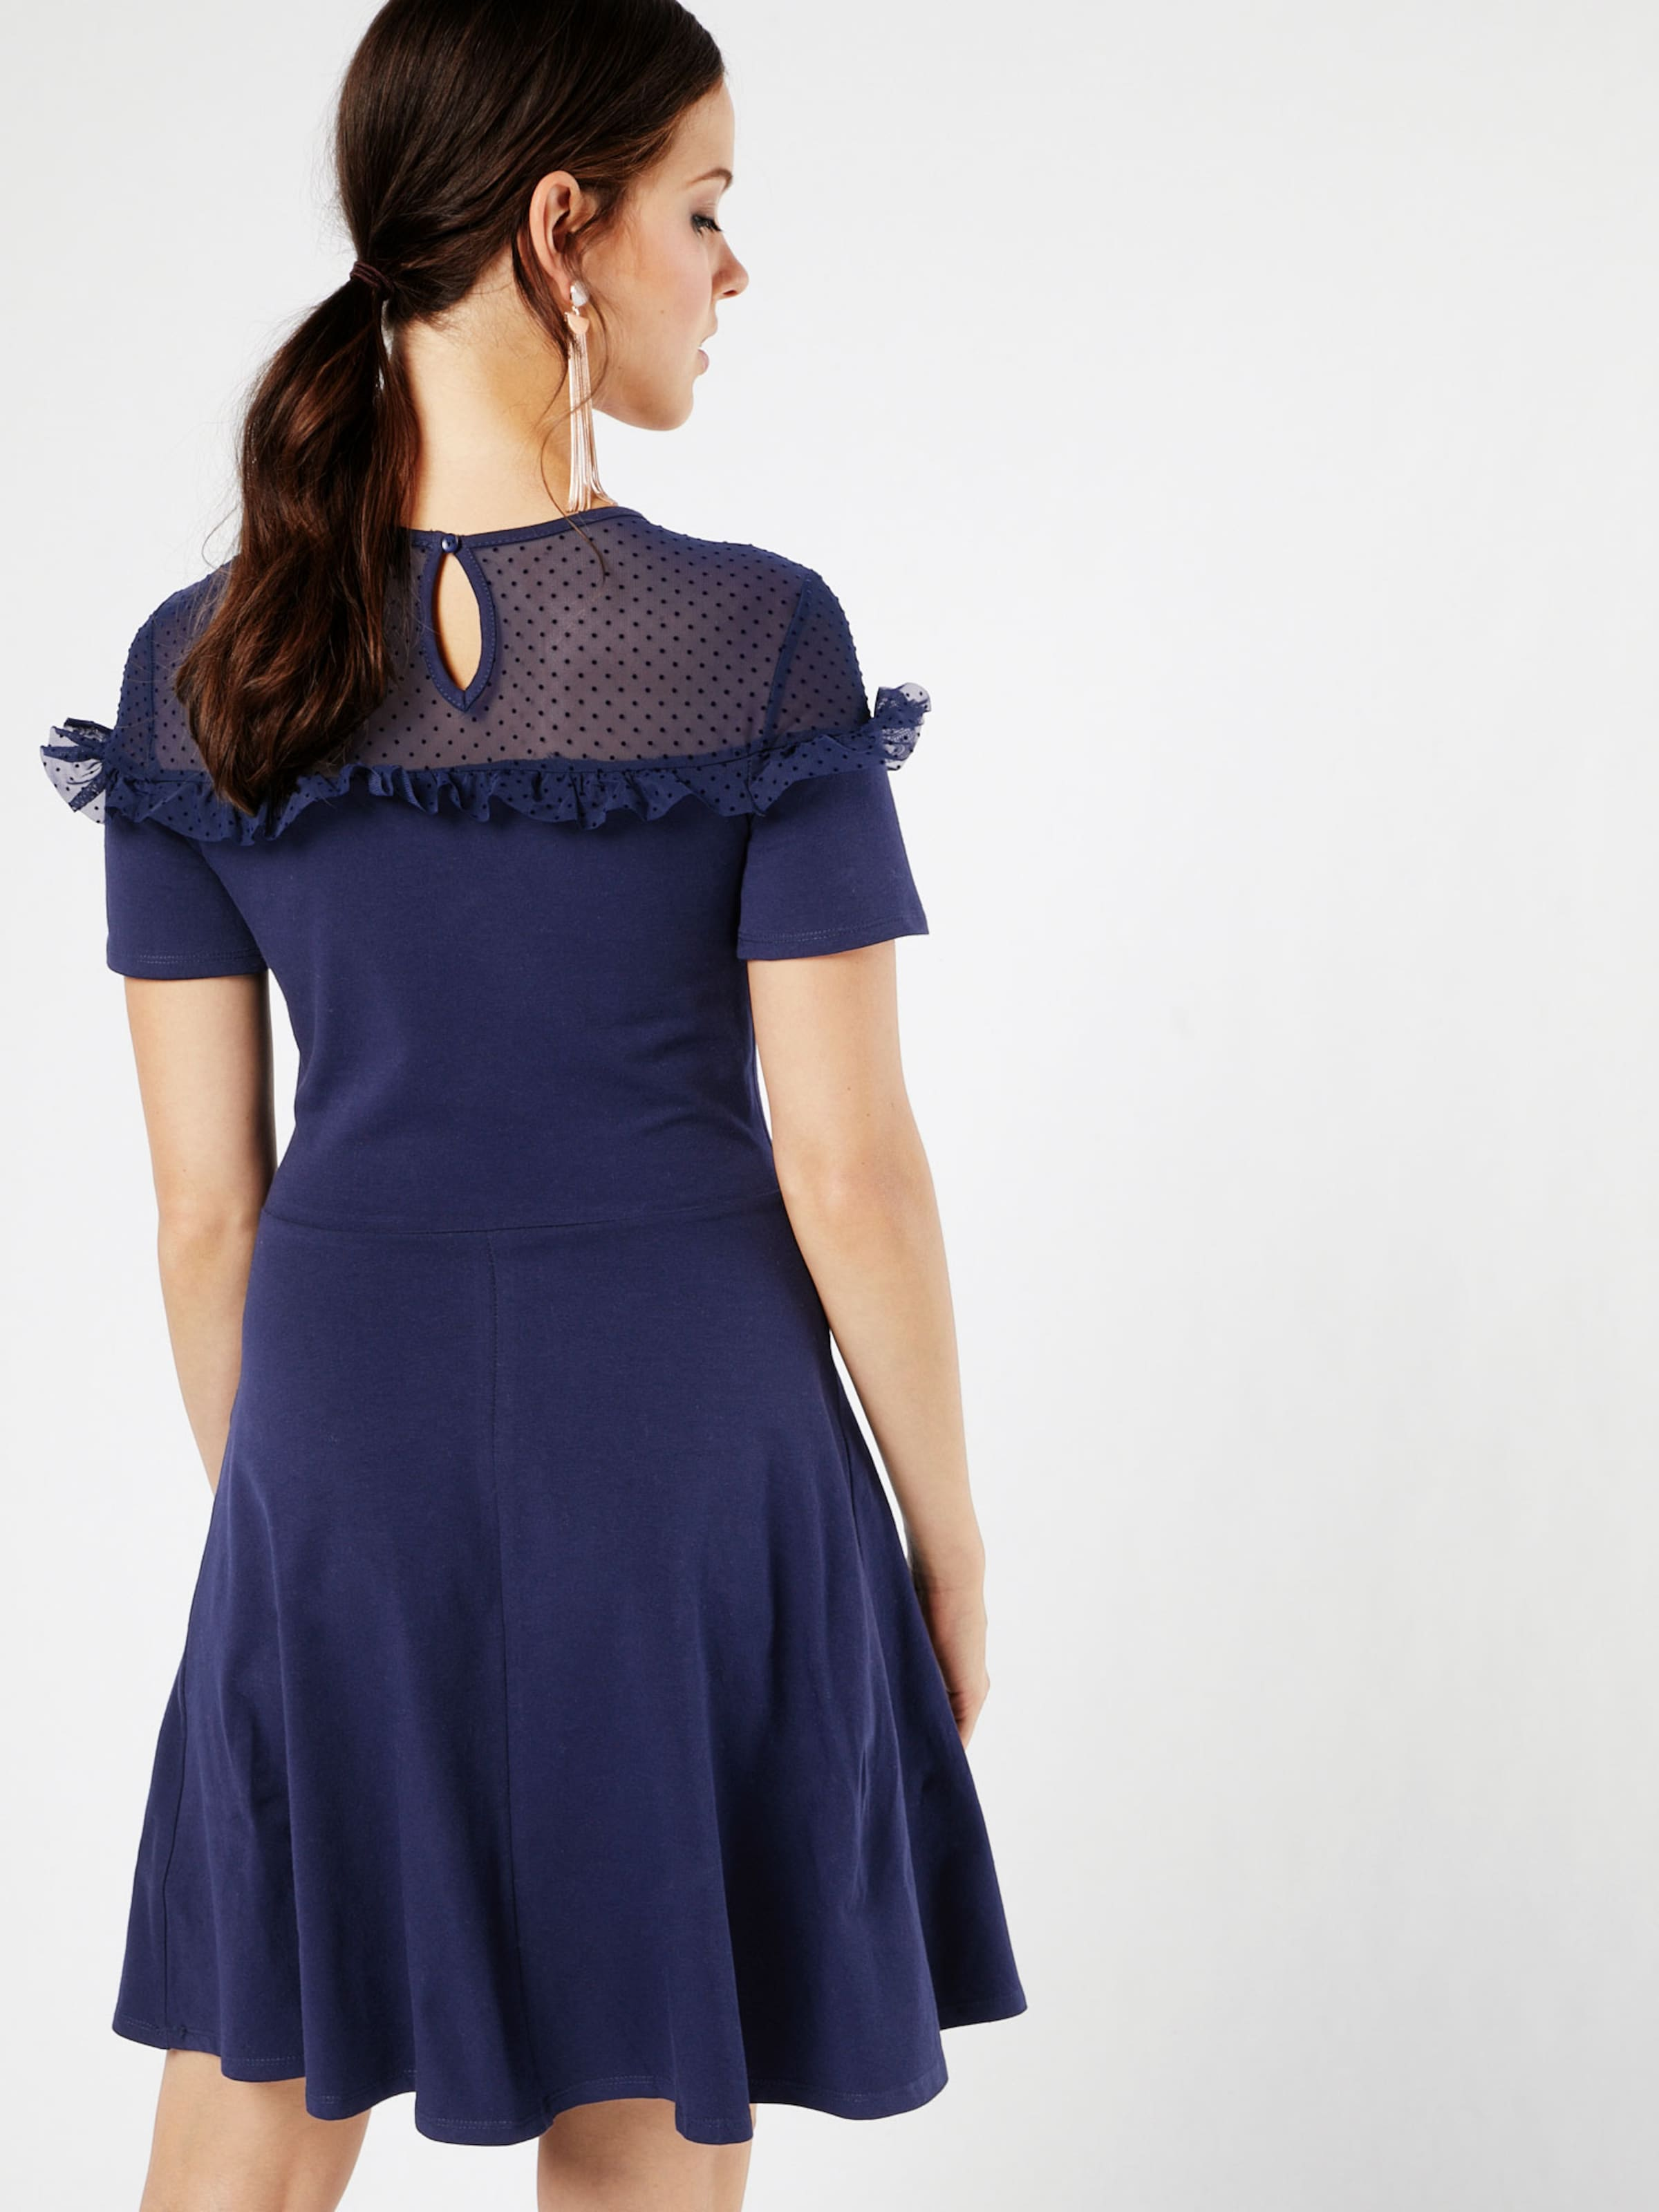 Billig Bequem Dorothy Perkins Kleid 'Dobbie' Billig Verkauf 2018 Neue 1YPLSD